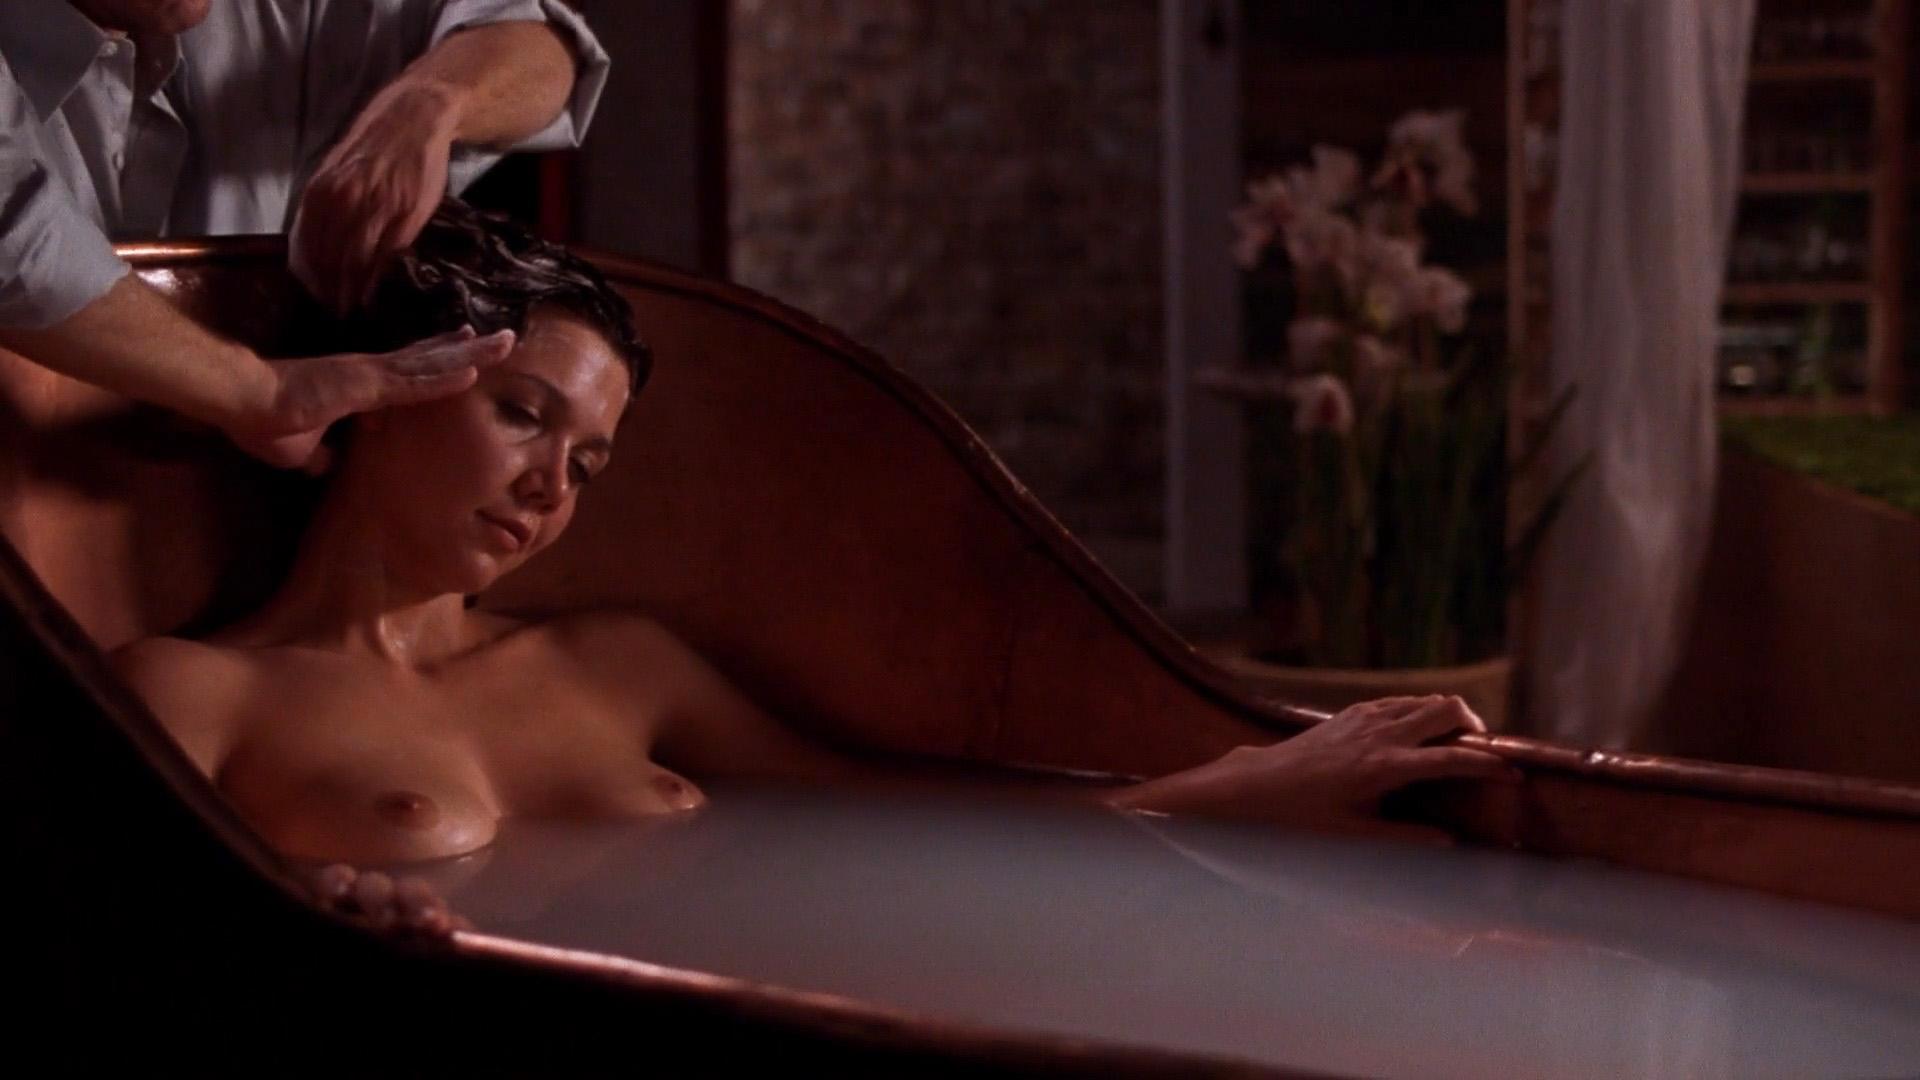 Secretary maggie gyllenhaal nude rather